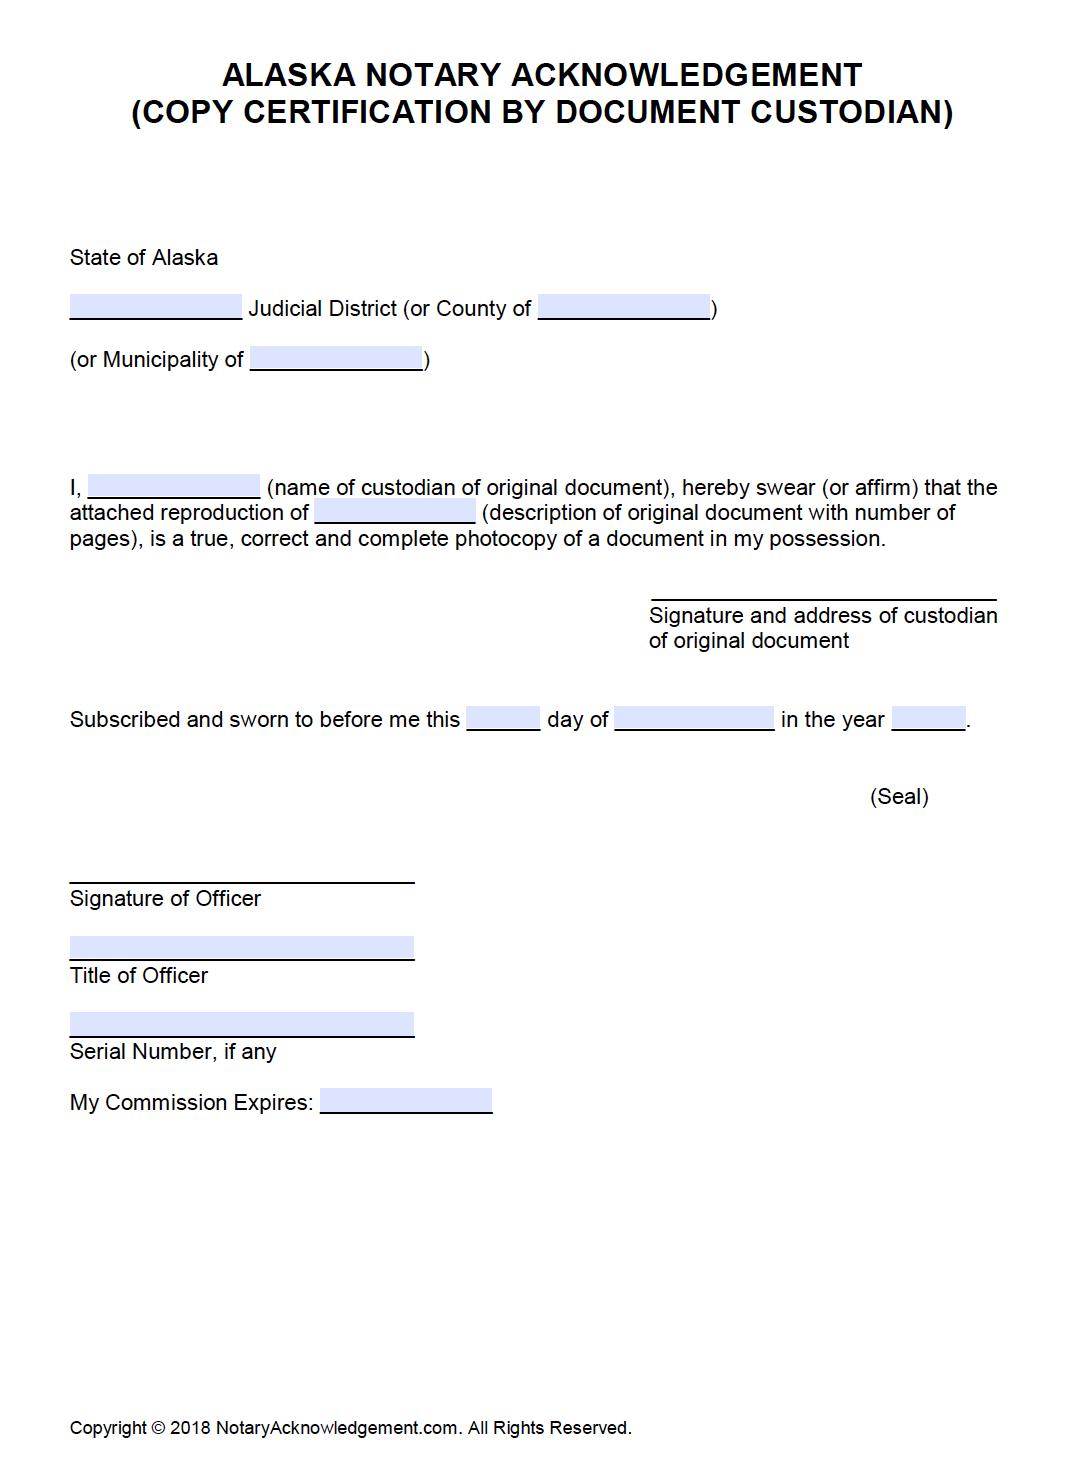 document copy certification custodian alaska certificate notarial pdf notary acknowledgement word ak downloads